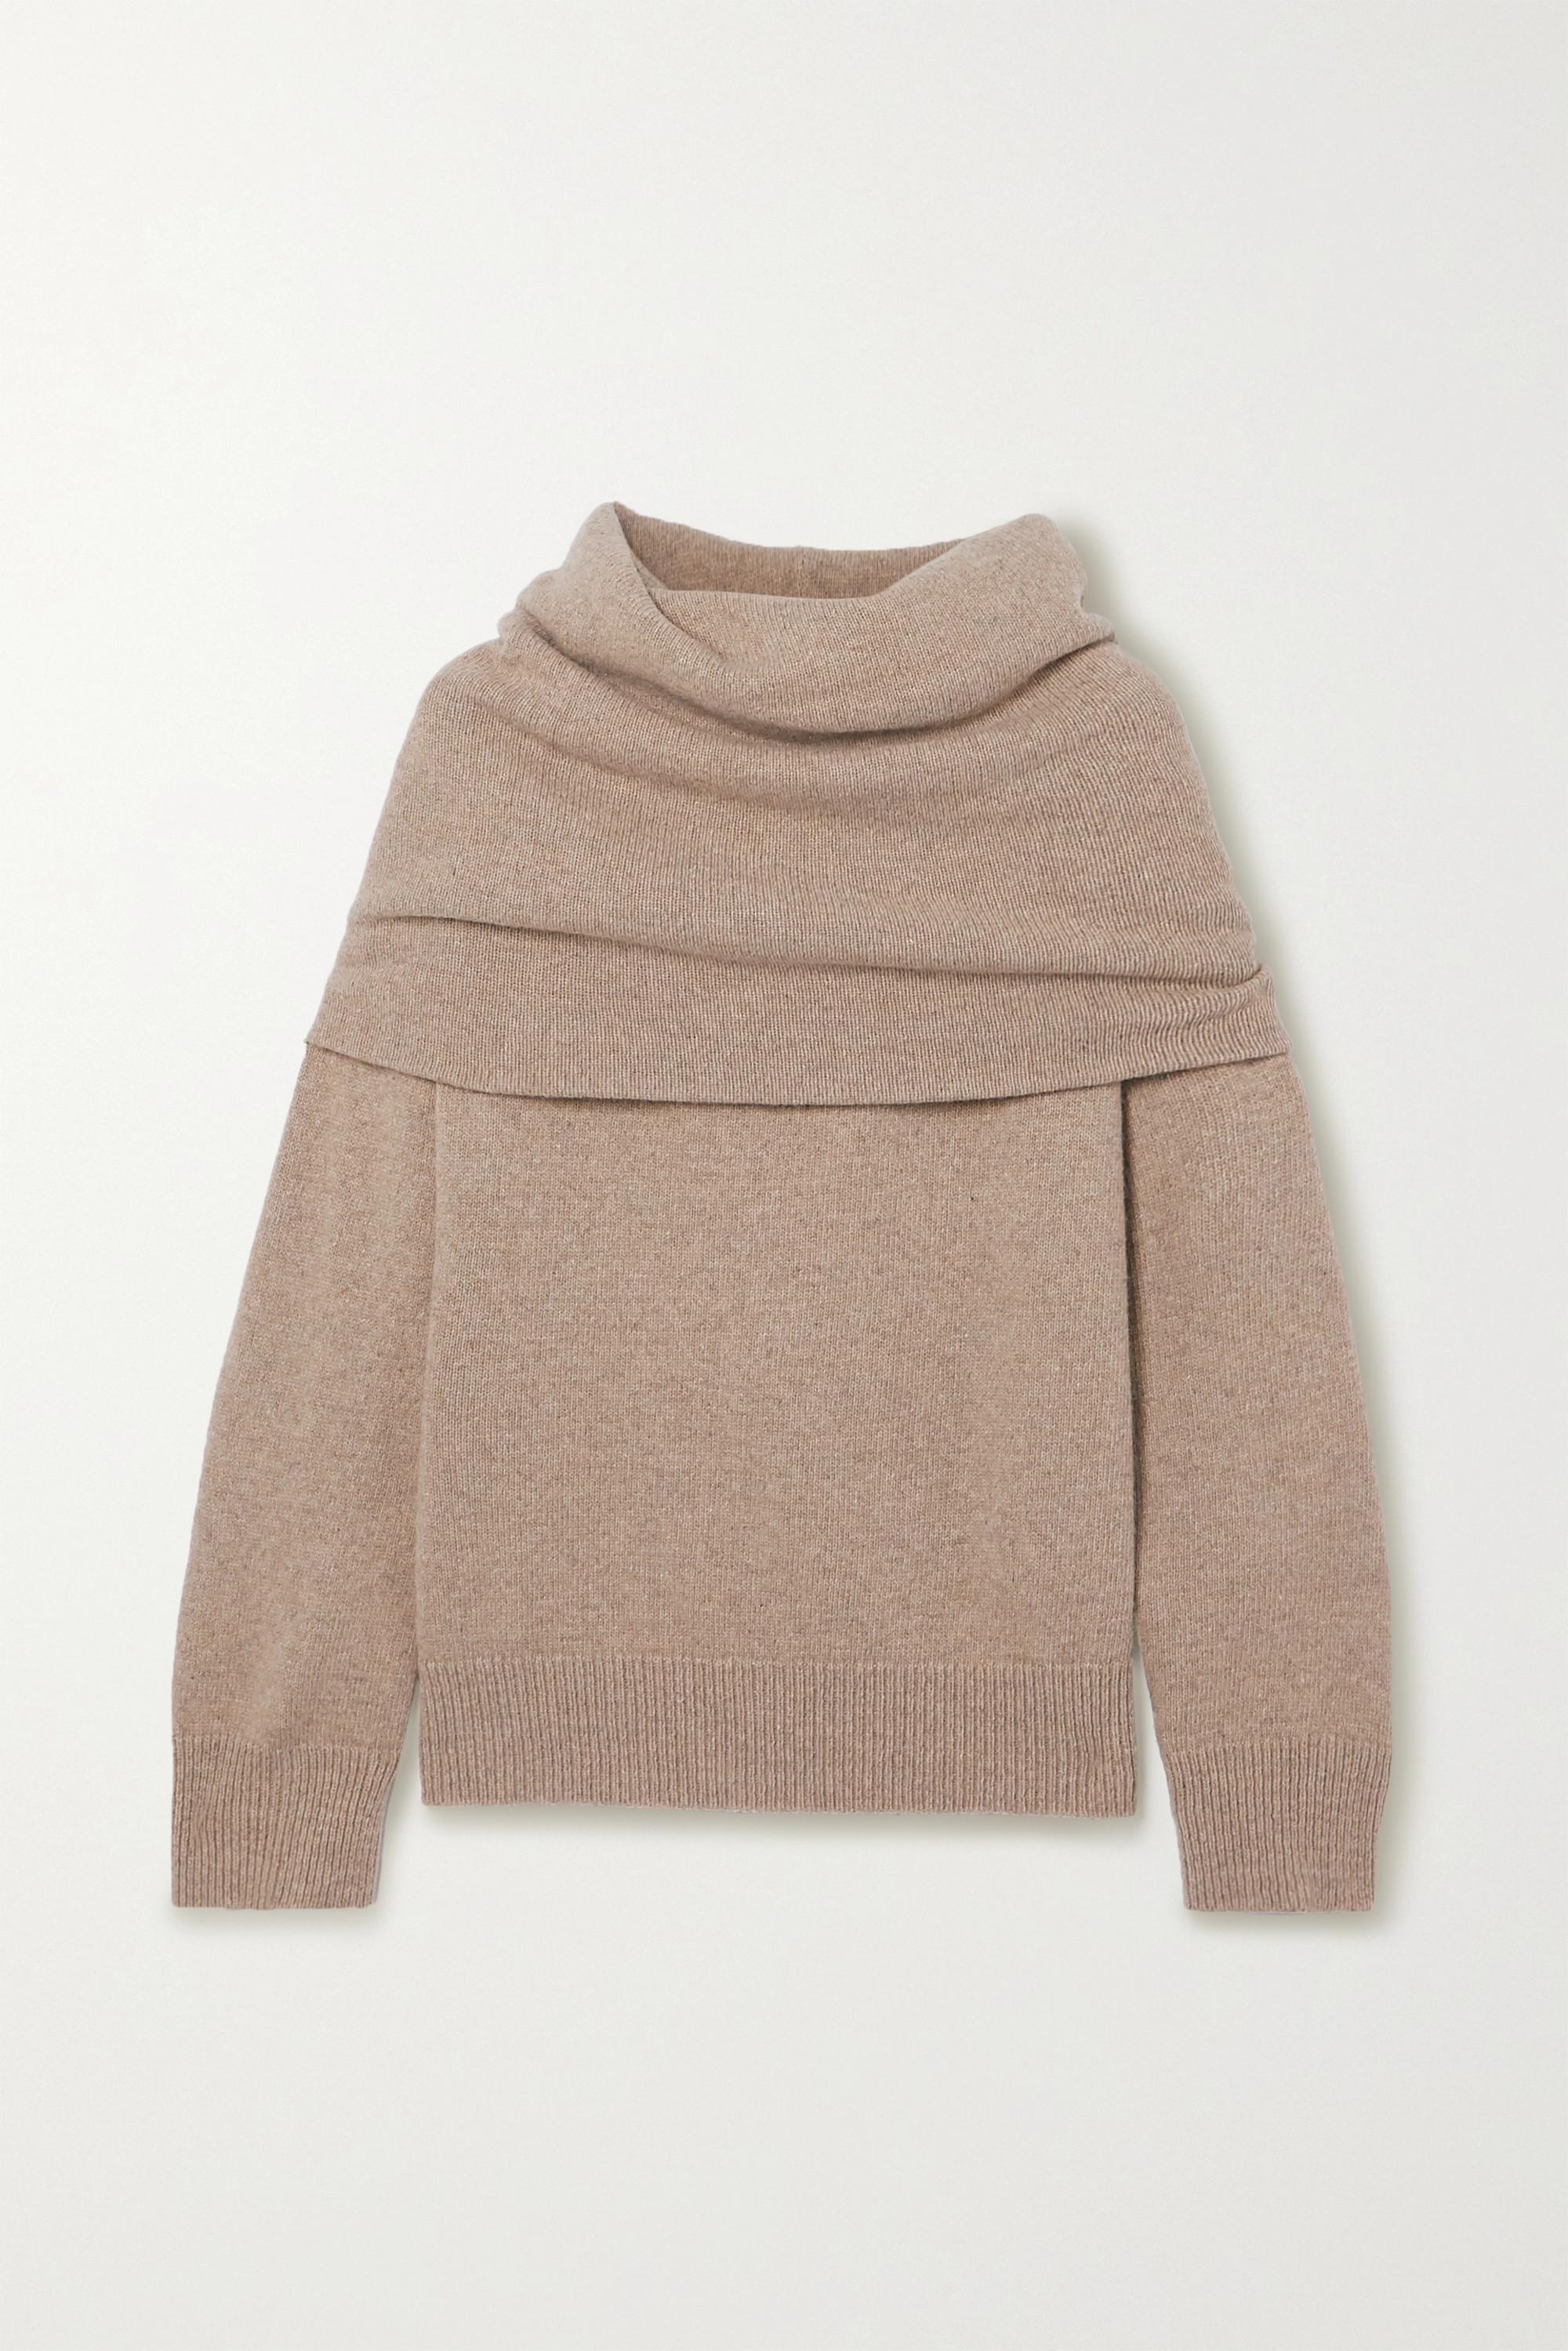 Frankie Shop Oversized hooded sweater